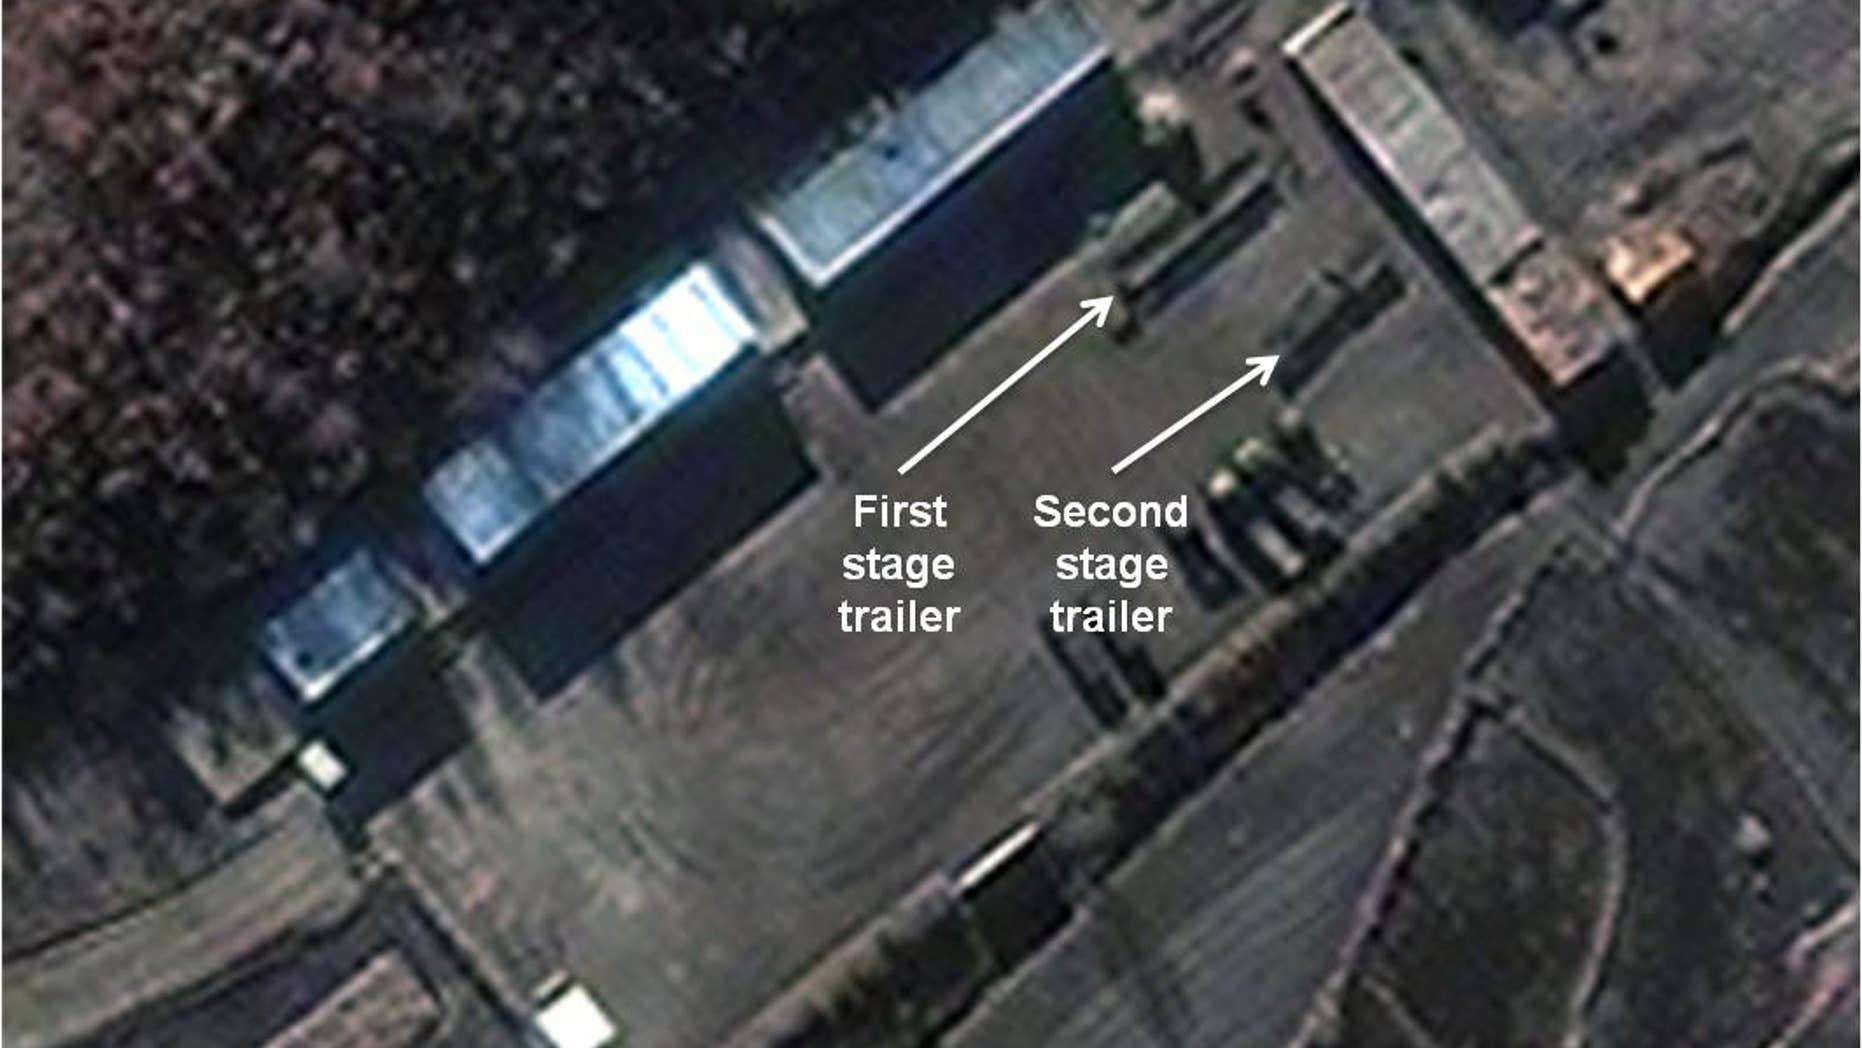 Nov. 26, 2012 - Satellite image provided by DigitalGlobe shows Sohae Satellite Launch Station in Cholsan Co, North Pyongan Province, N Korea.